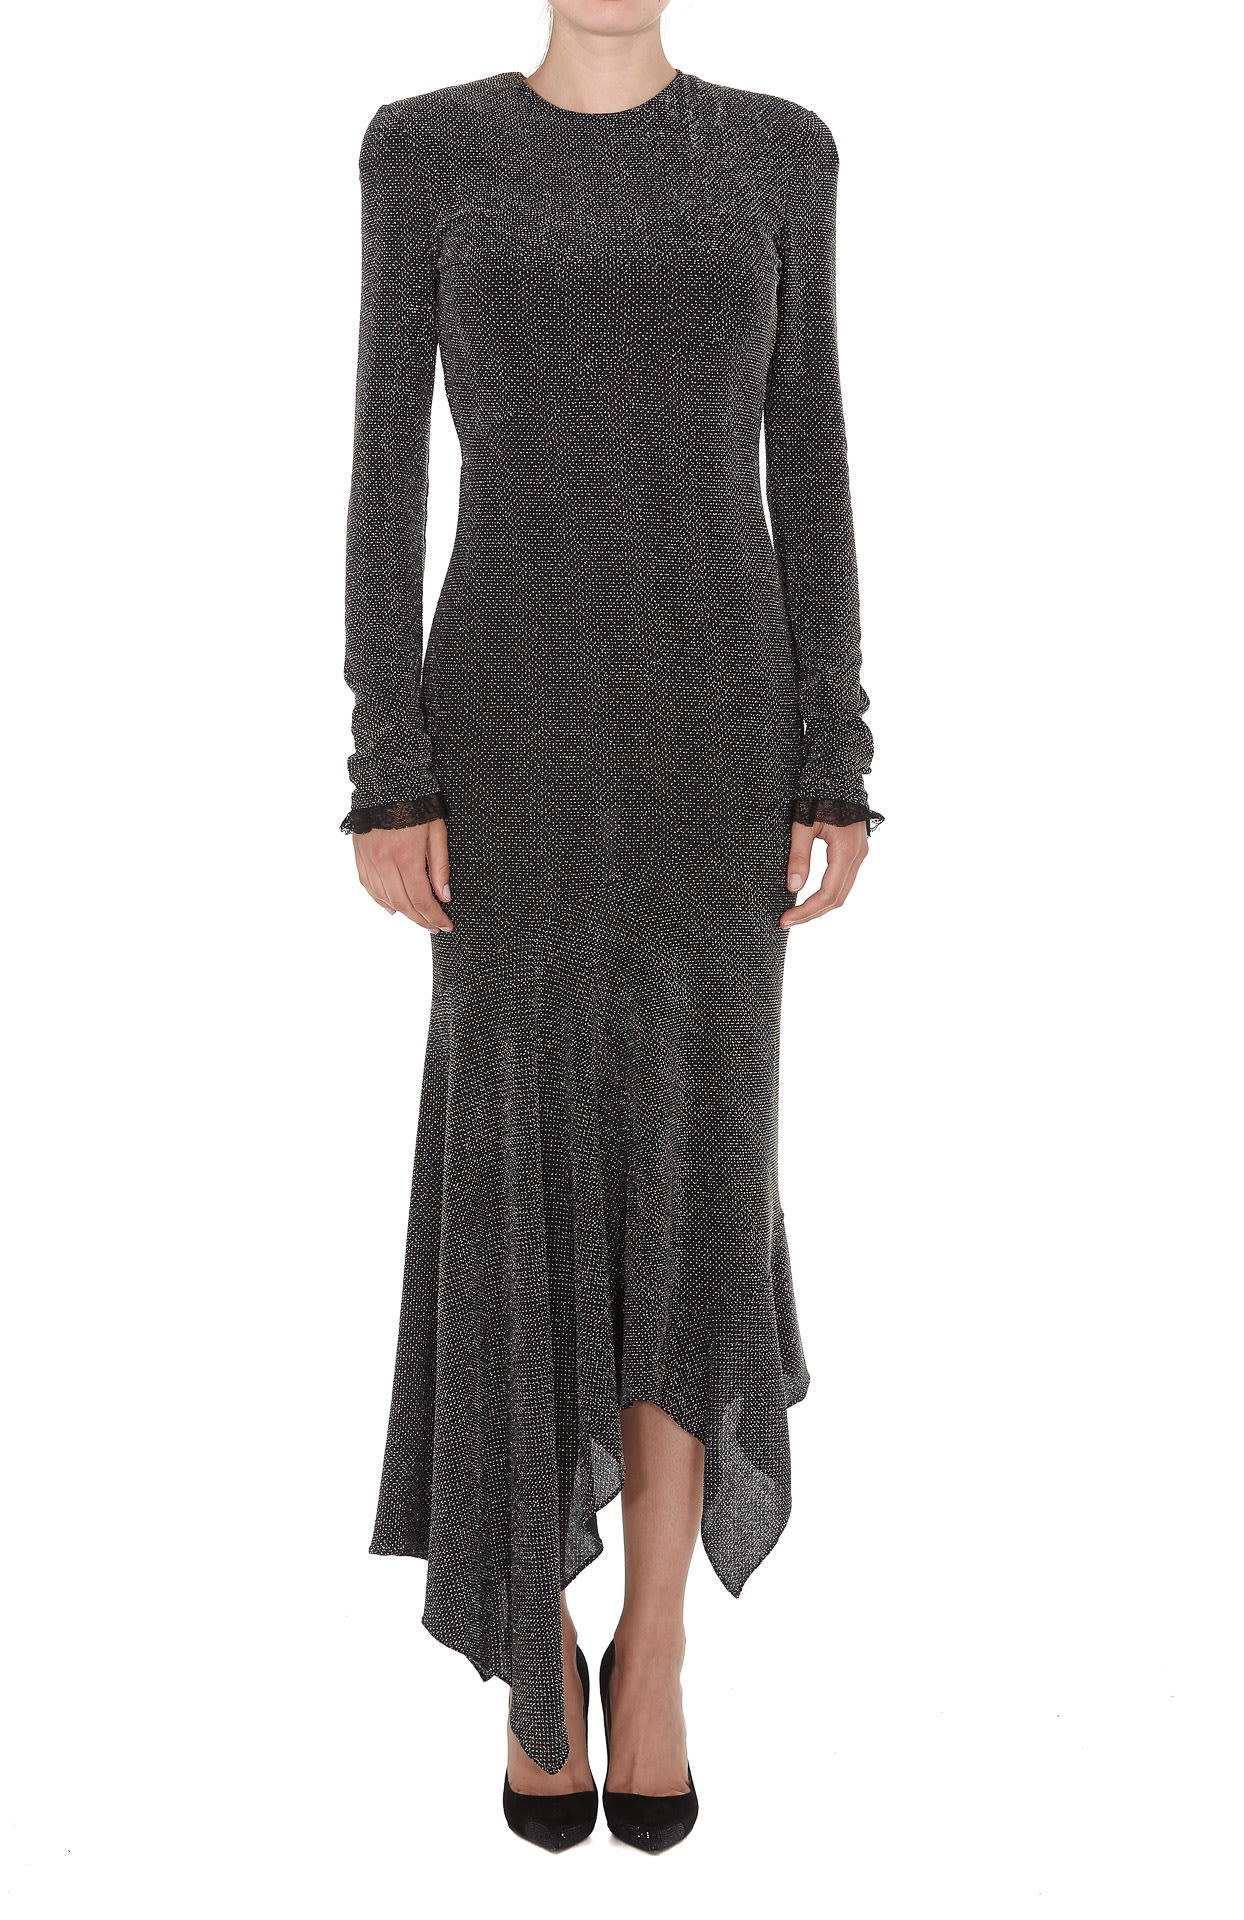 Philosophy Di Lorenzo Serafini Metallic Effect Dress